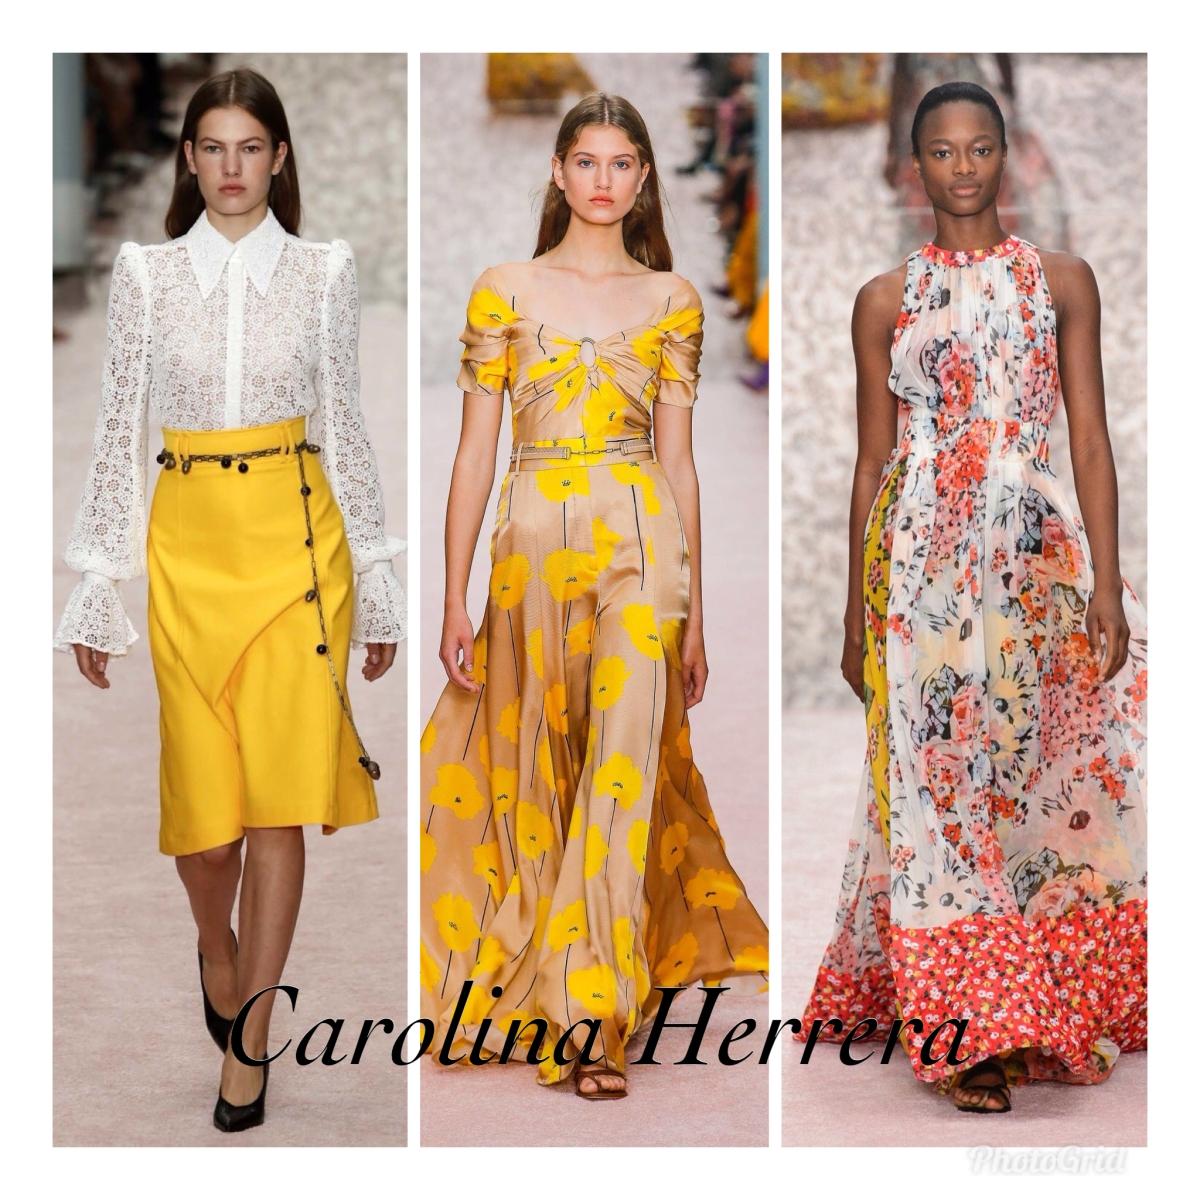 Carolina Herrera Spring 2019